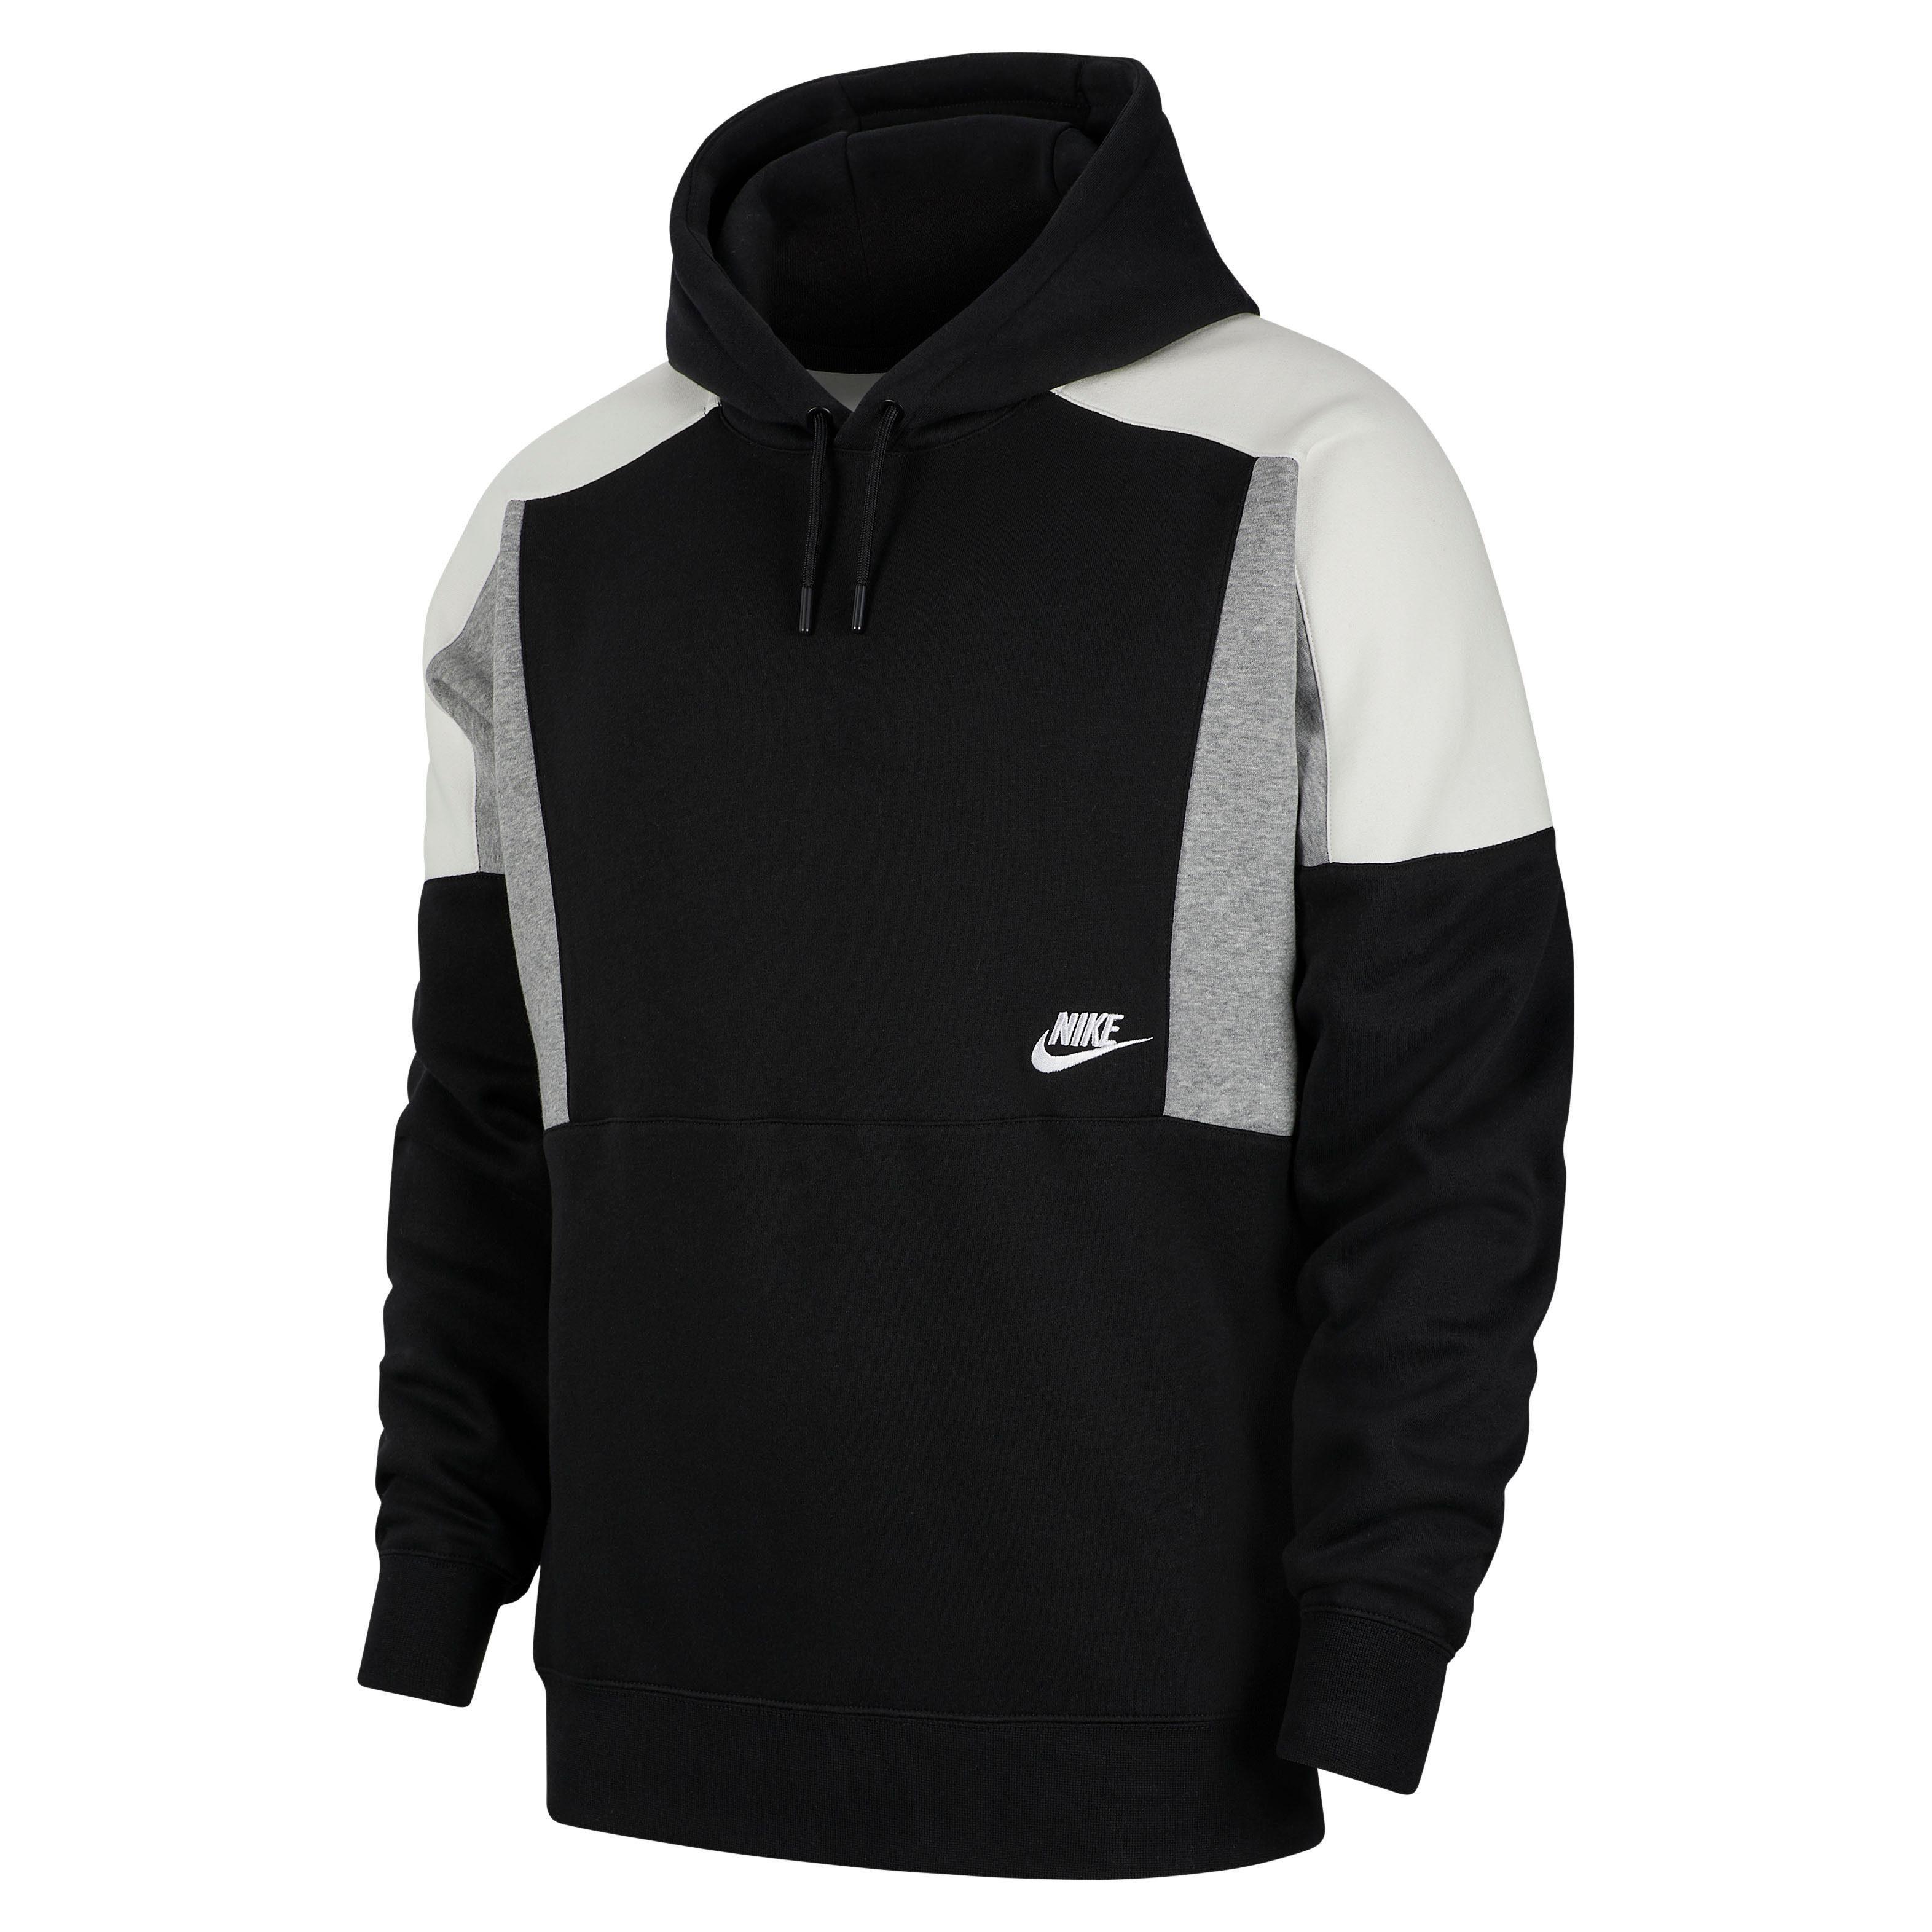 Nike Sportswear Kapuzensweatshirt »Men's Color block Pullover Hoodie« online kaufen   OTTO